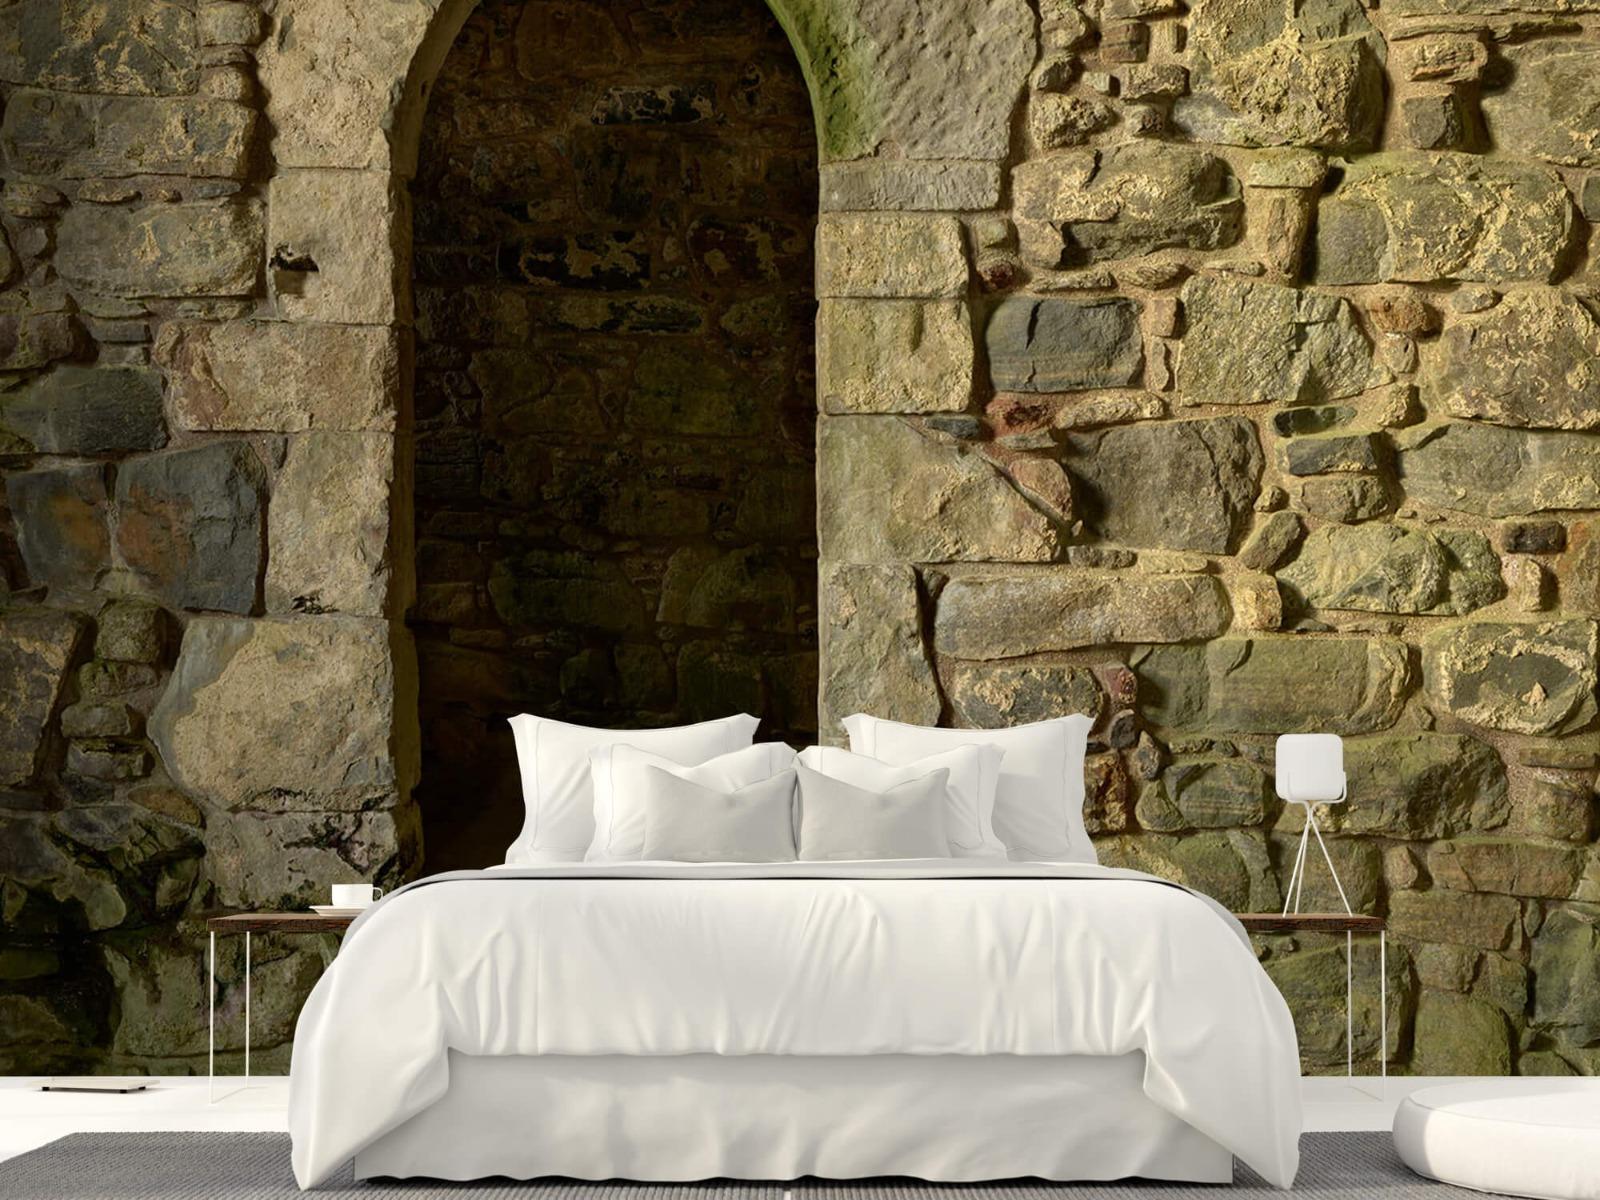 Steen behang - Oude muur met doorgang - Slaapkamer 23